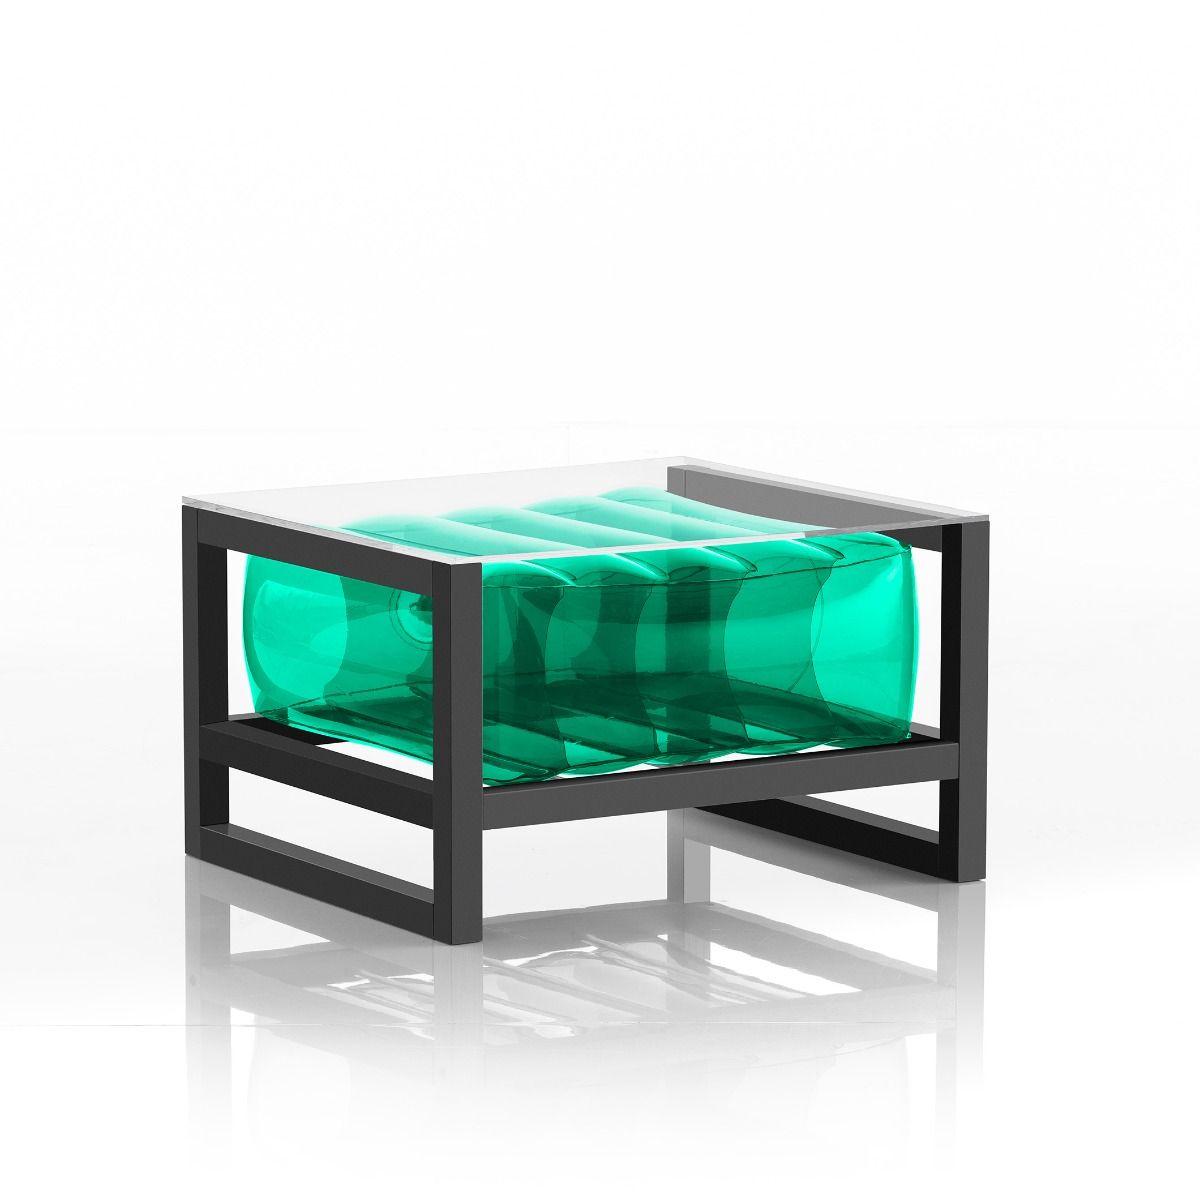 Table basse pvc verte cadre en aluminium